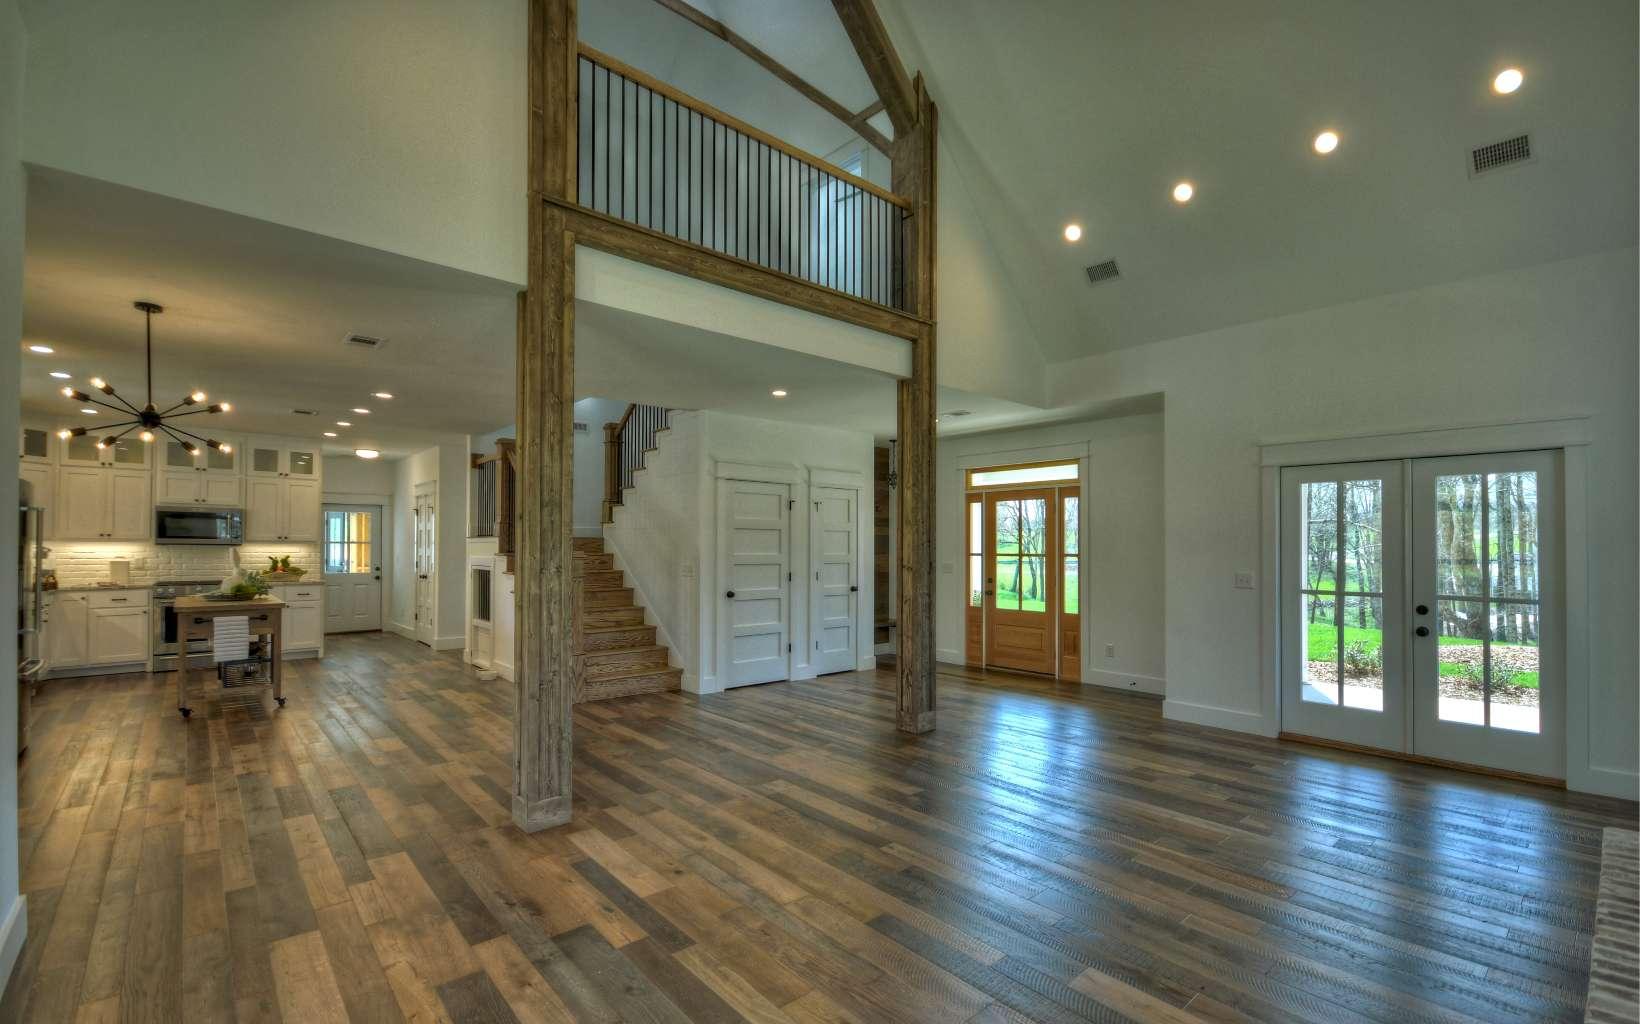 92 HIGHPOINT RIDGE CT, Ellijay, Georgia 30536, 3 Bedrooms Bedrooms, ,3 BathroomsBathrooms,Single Family,For Sale,92 HIGHPOINT RIDGE CT,2,305507